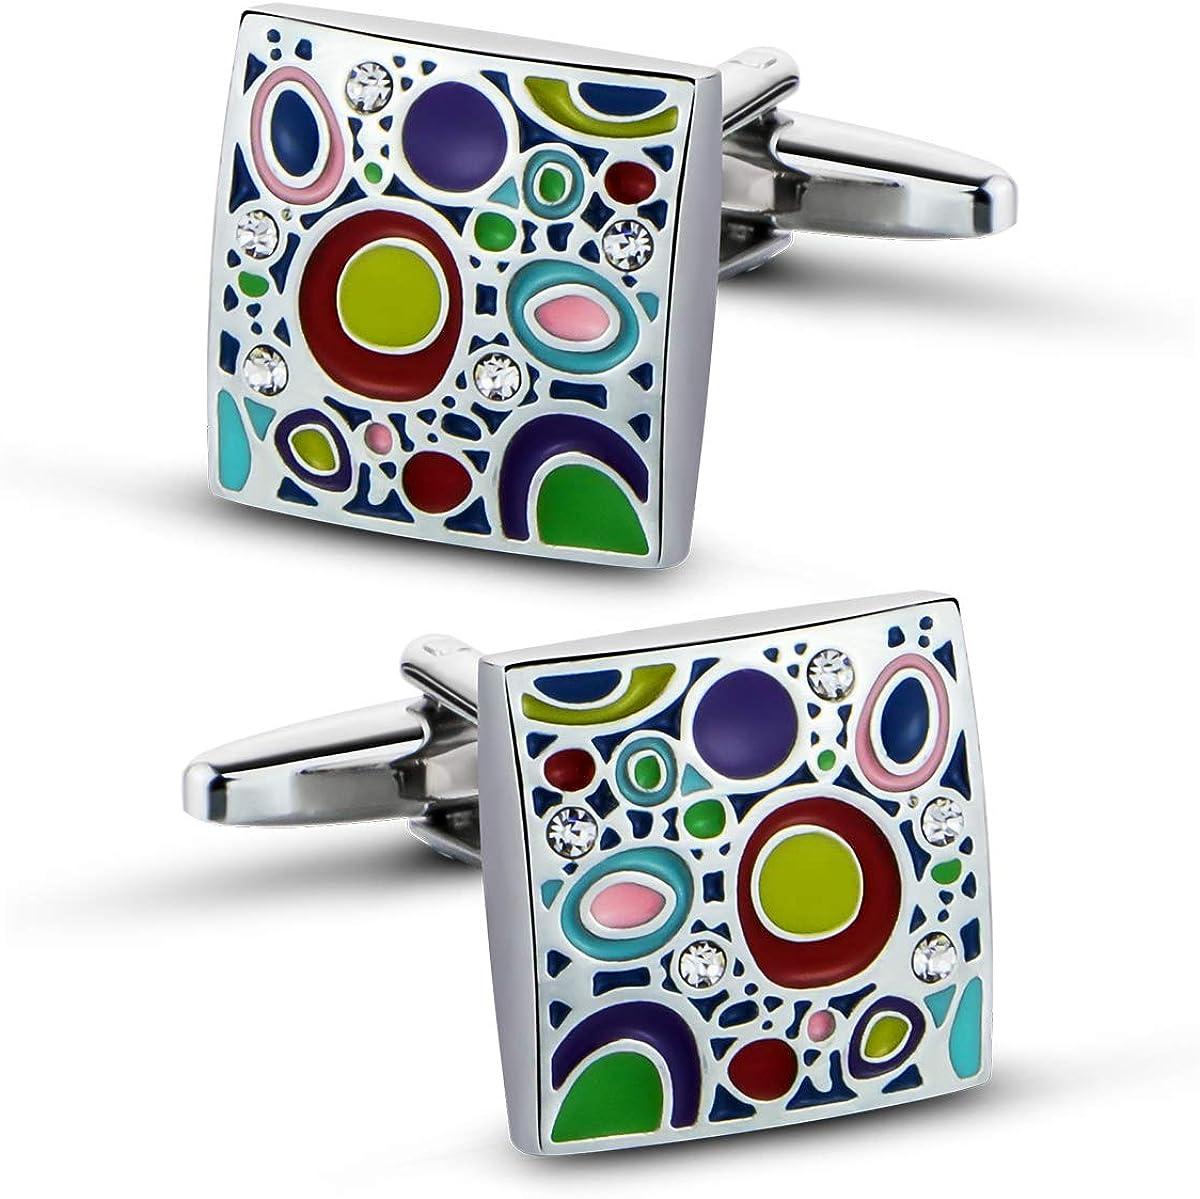 VIILOCK Silver Plated Cufflinks for Men Colorful Rainbow Crystal Cuff Links Wedding Gift